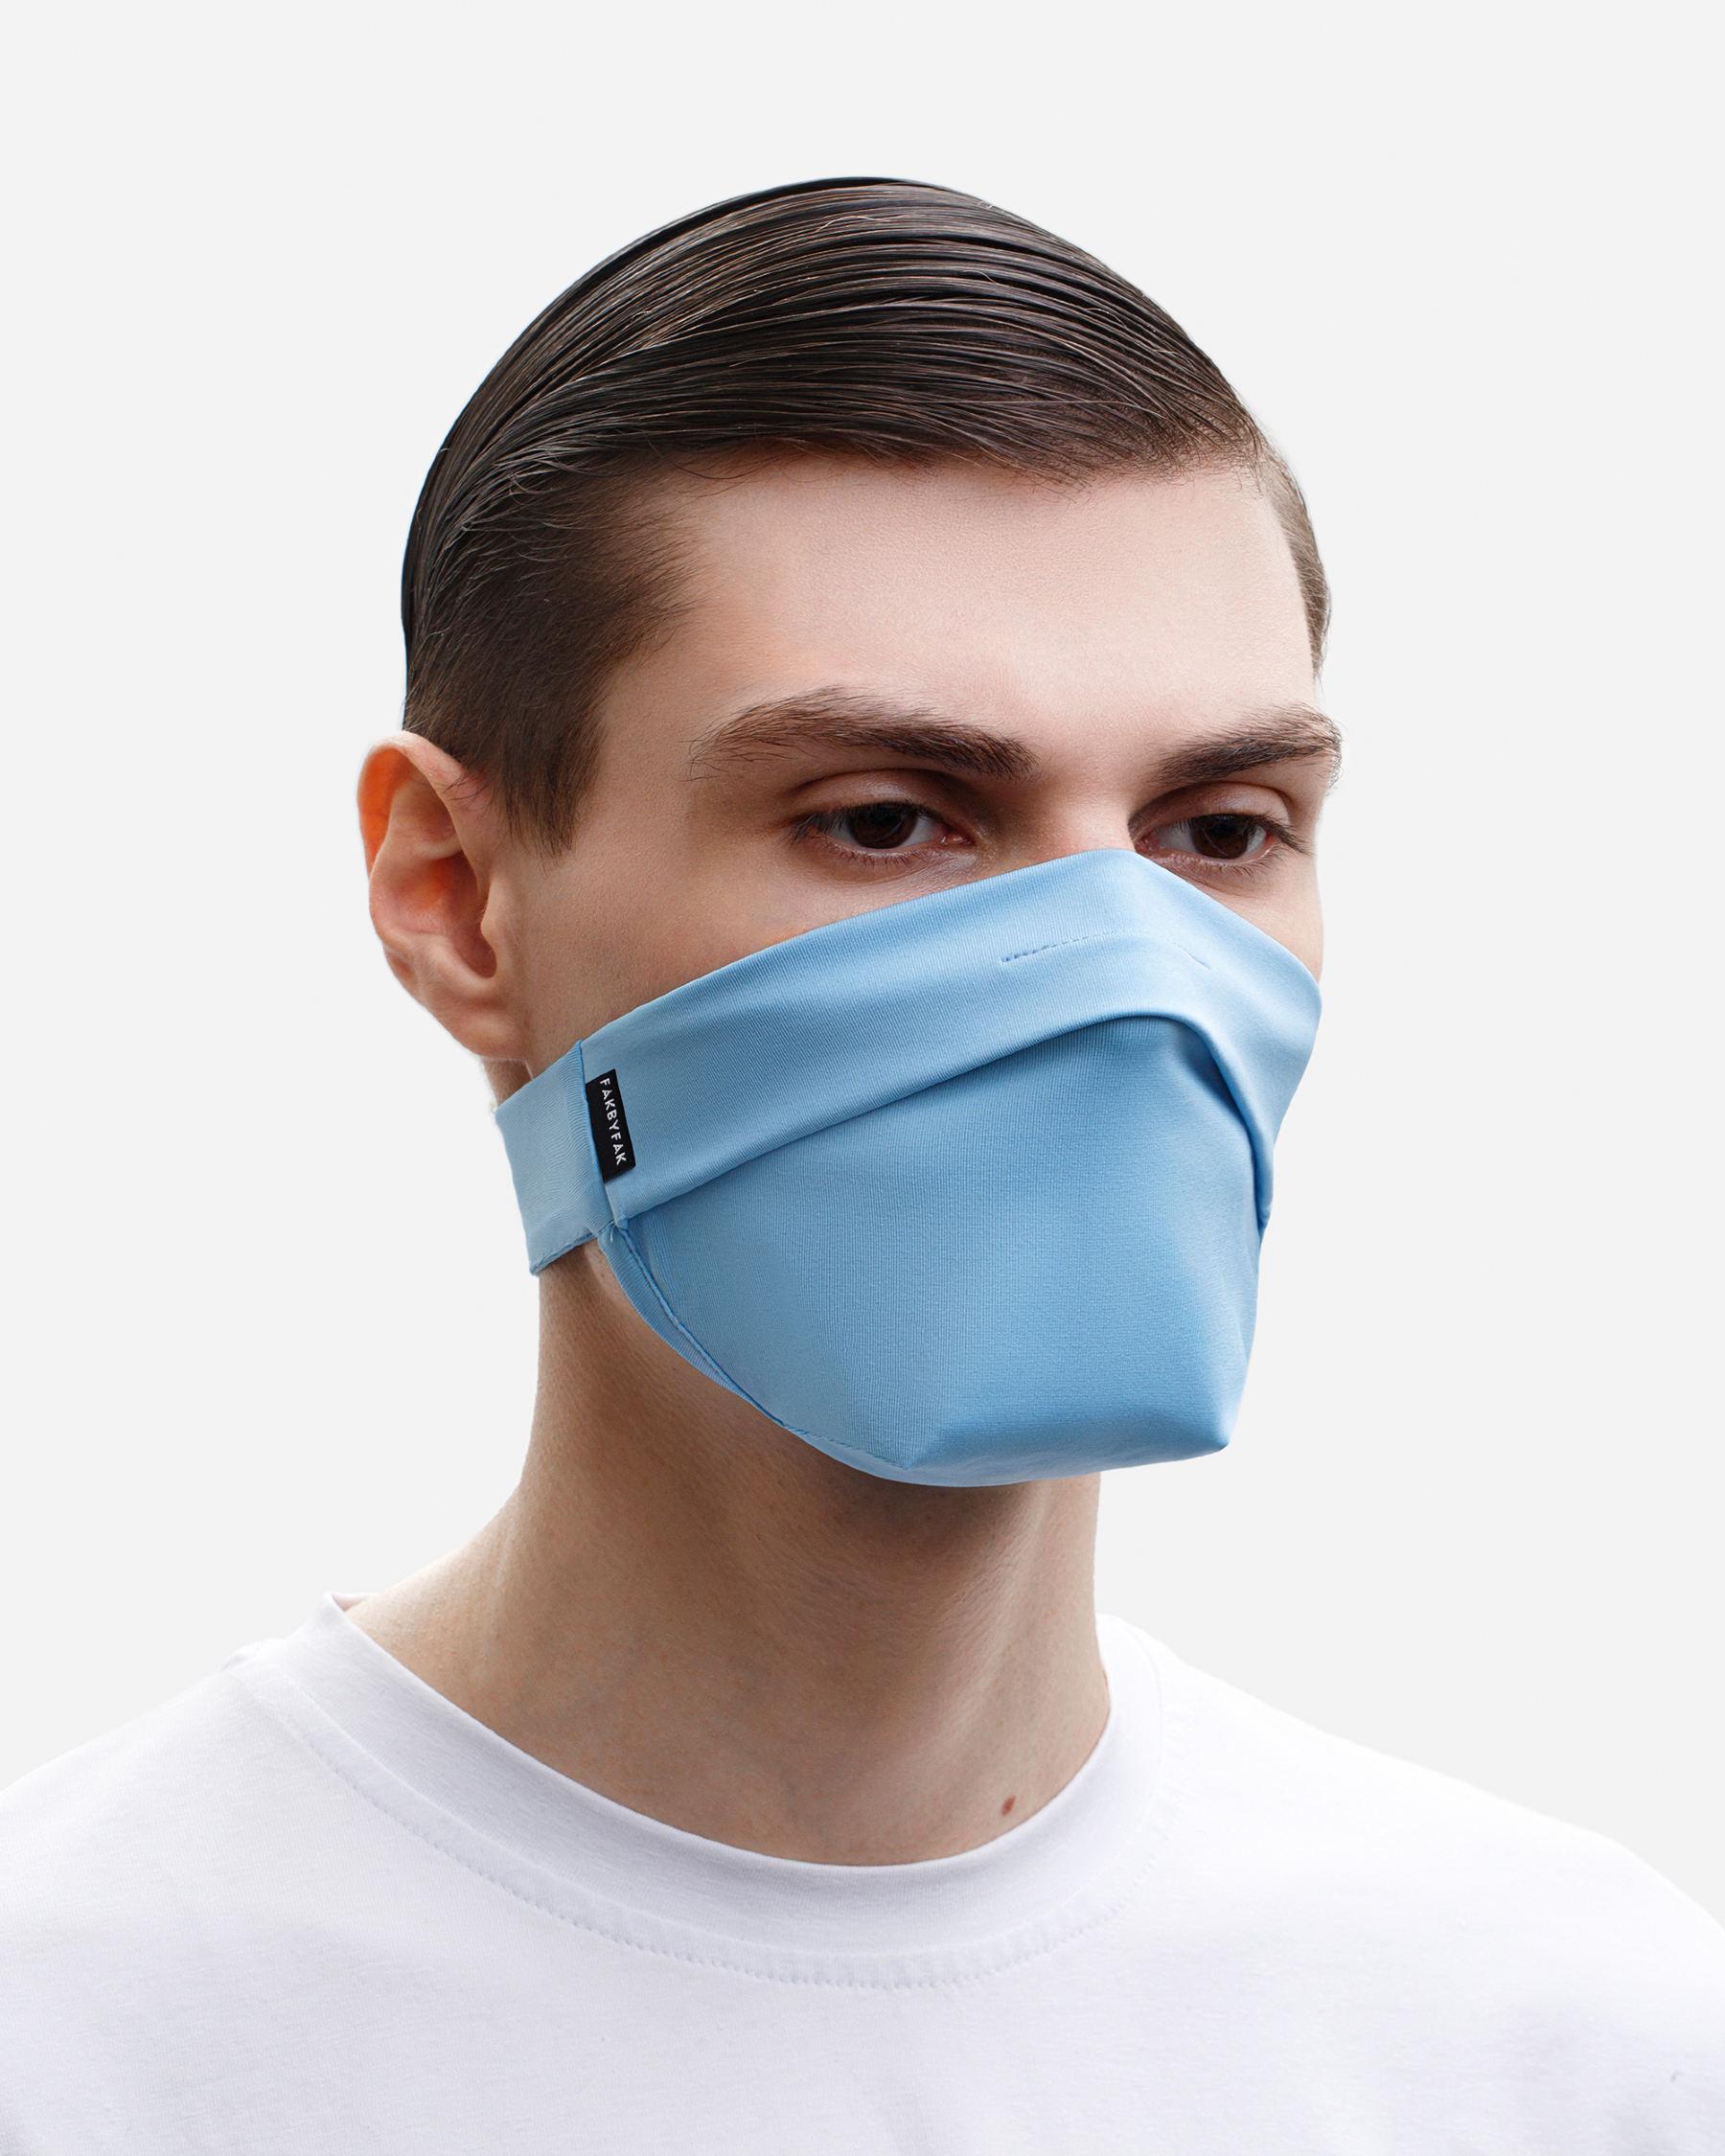 FAKBYFAK  The Vega. Ear Strap-Free High-End Protective Antibacterial (ATB-UV+) Face Mask. Light Blue Code: FBF-42101-75